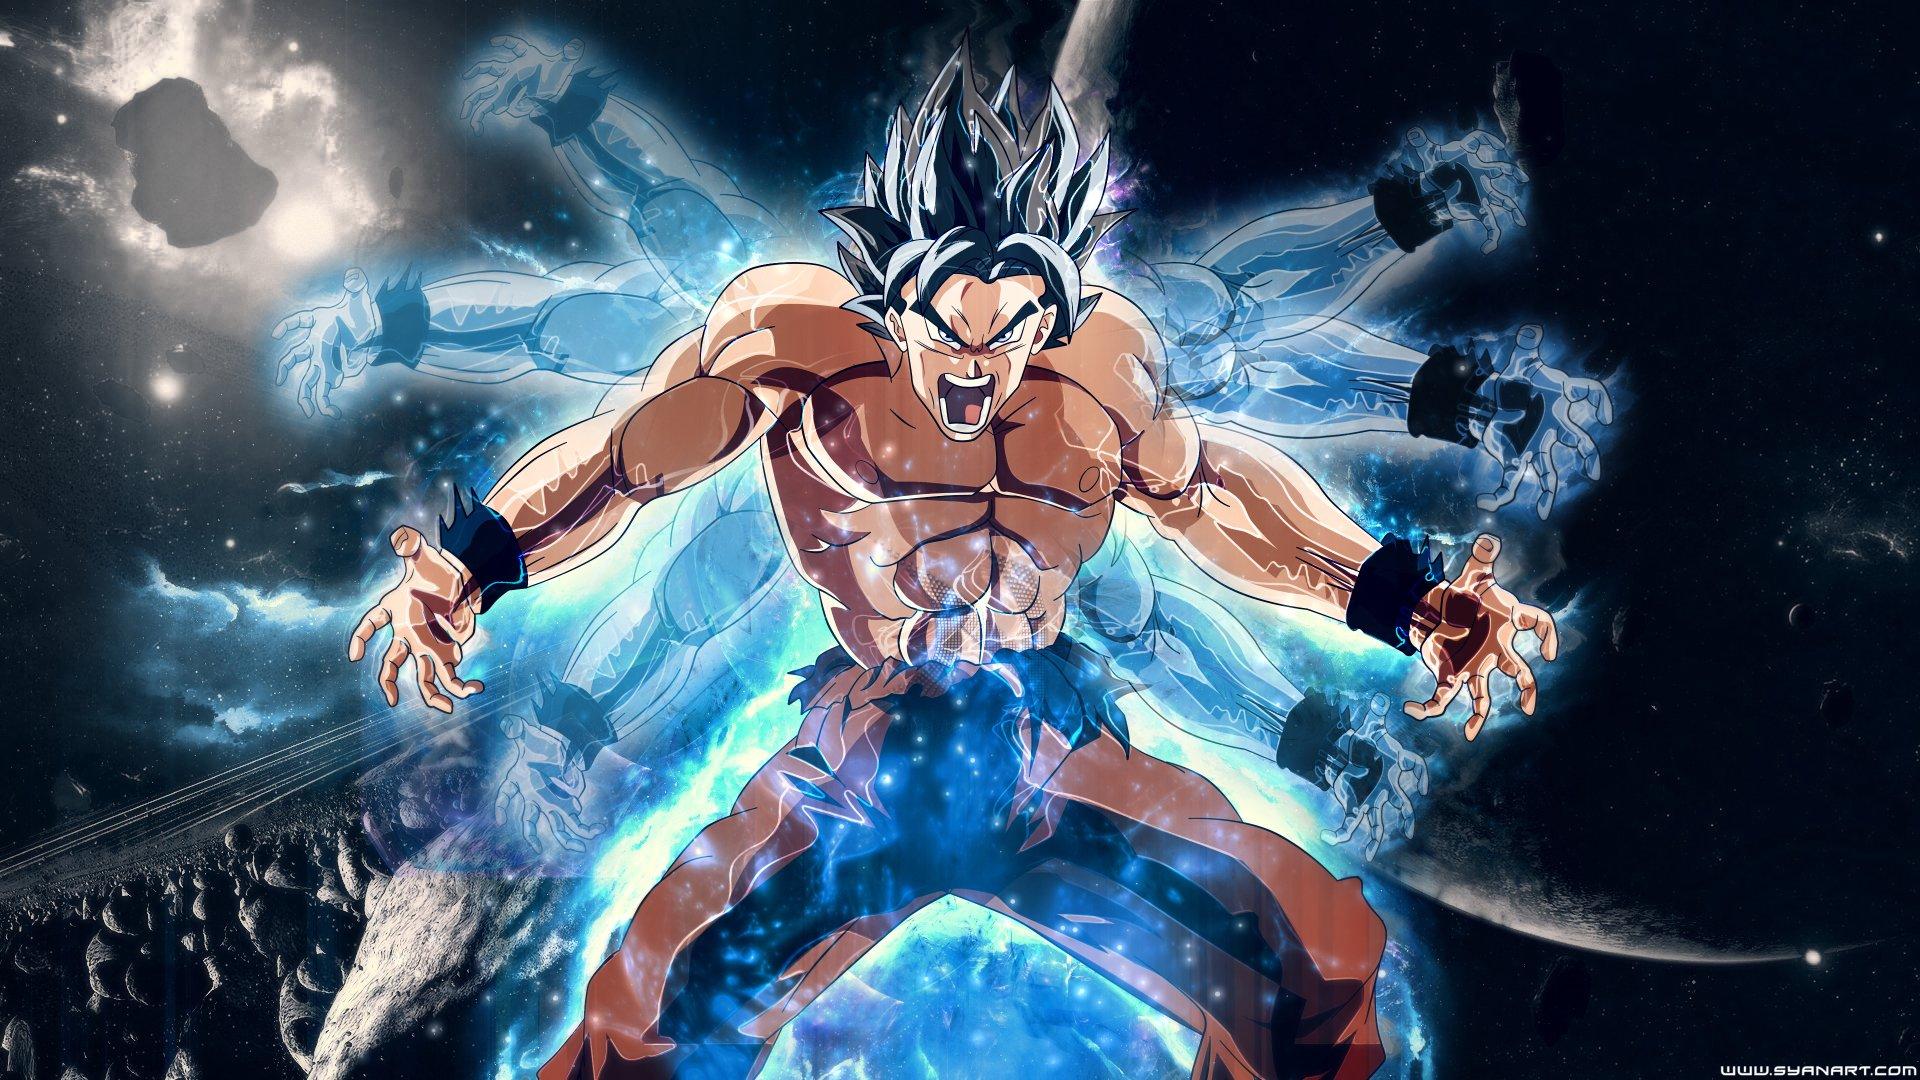 Los Mejores Fondos De Pantalla De Goku Migatte No Gokui Hd: Dragon Ball Super Goku Migatte No Gokui 4k Ultra Fondo De